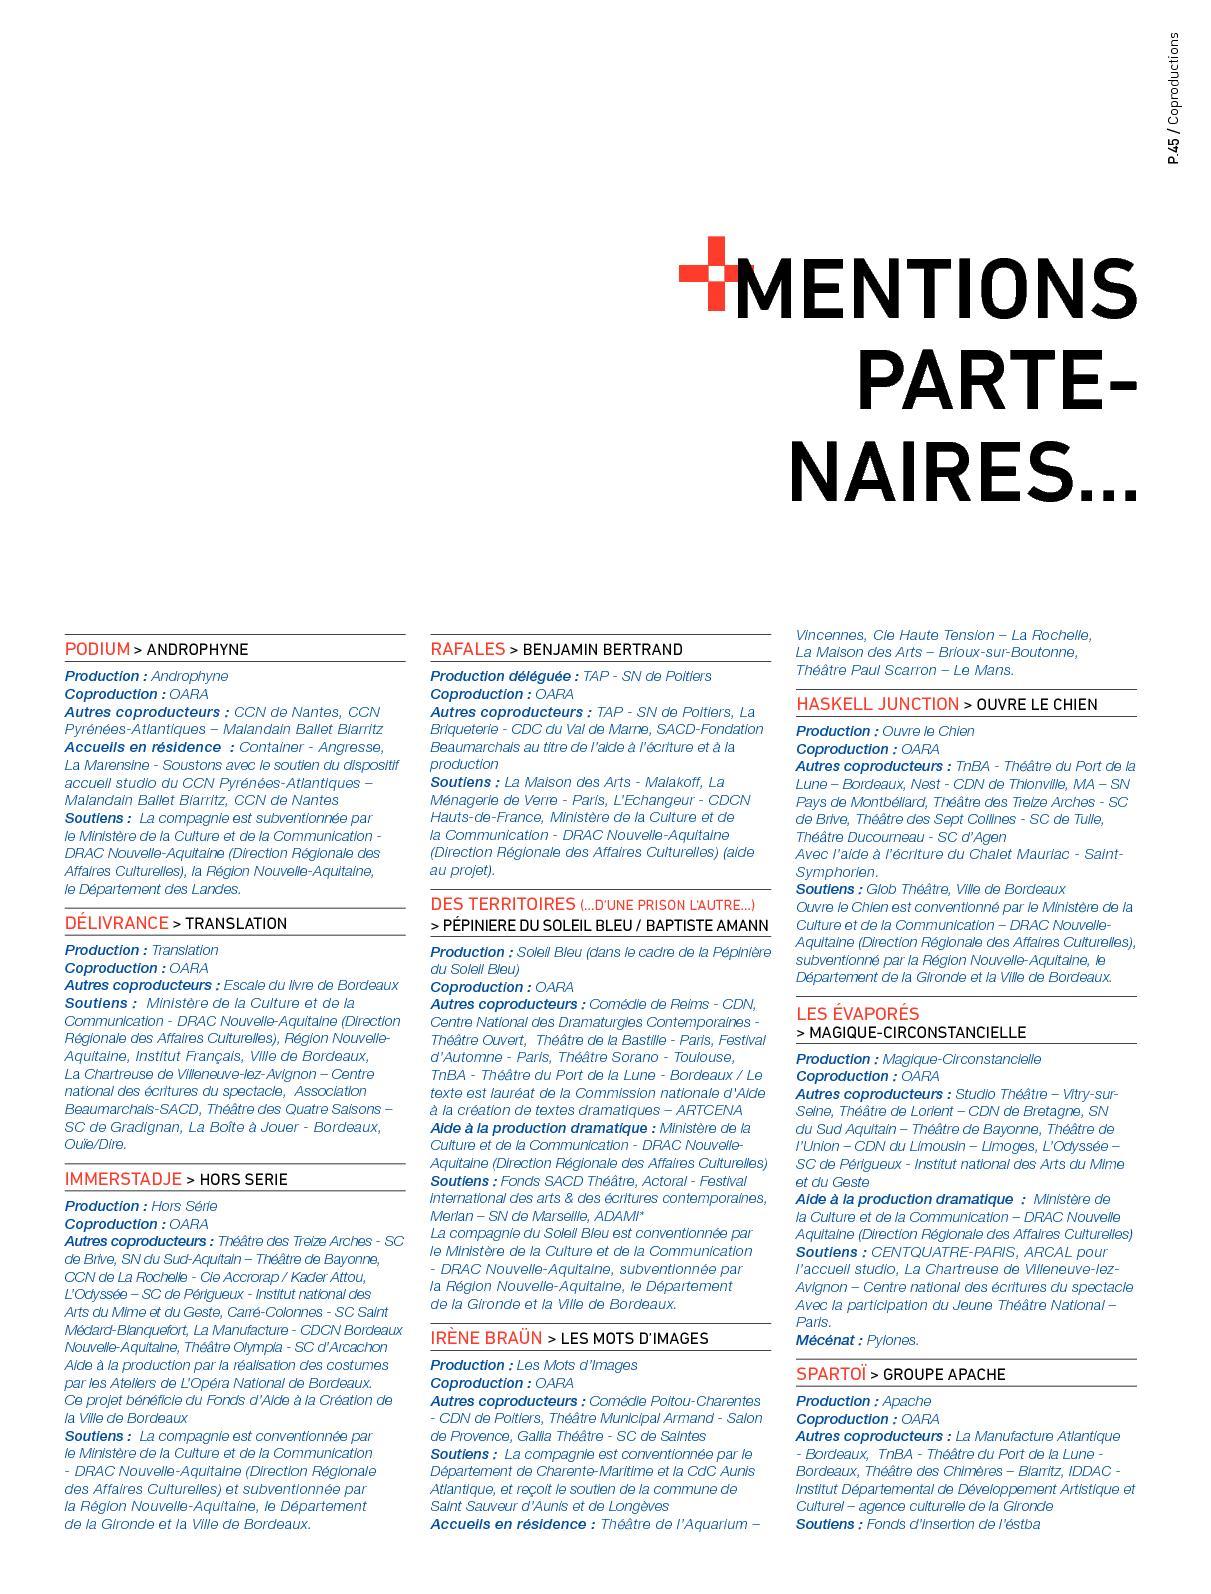 Salon De Jardin Nantes Beau Saison 2017 18 Calameo Downloader Of 36 Frais Salon De Jardin Nantes